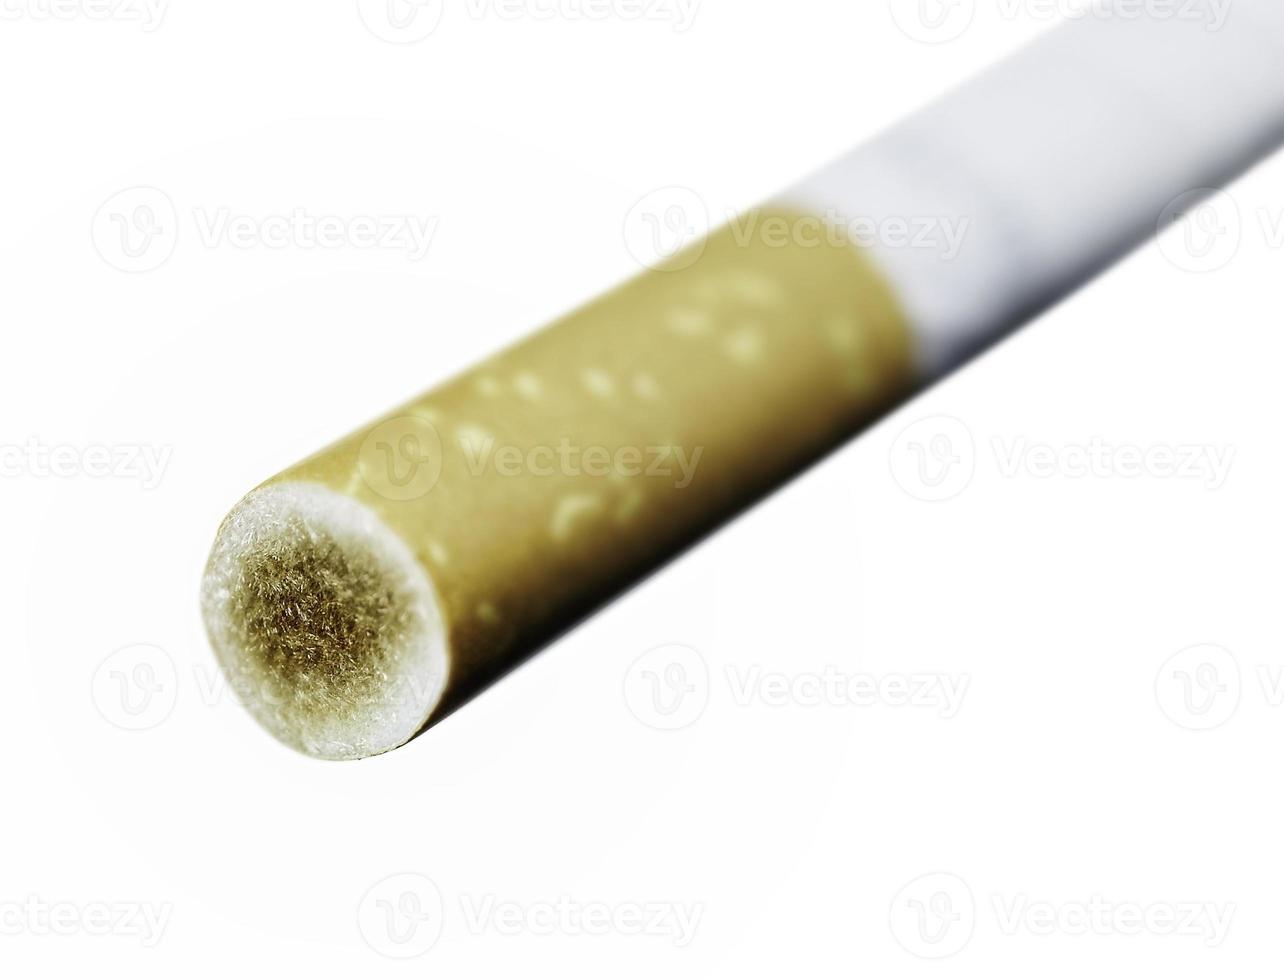 filtre à nicotine photo